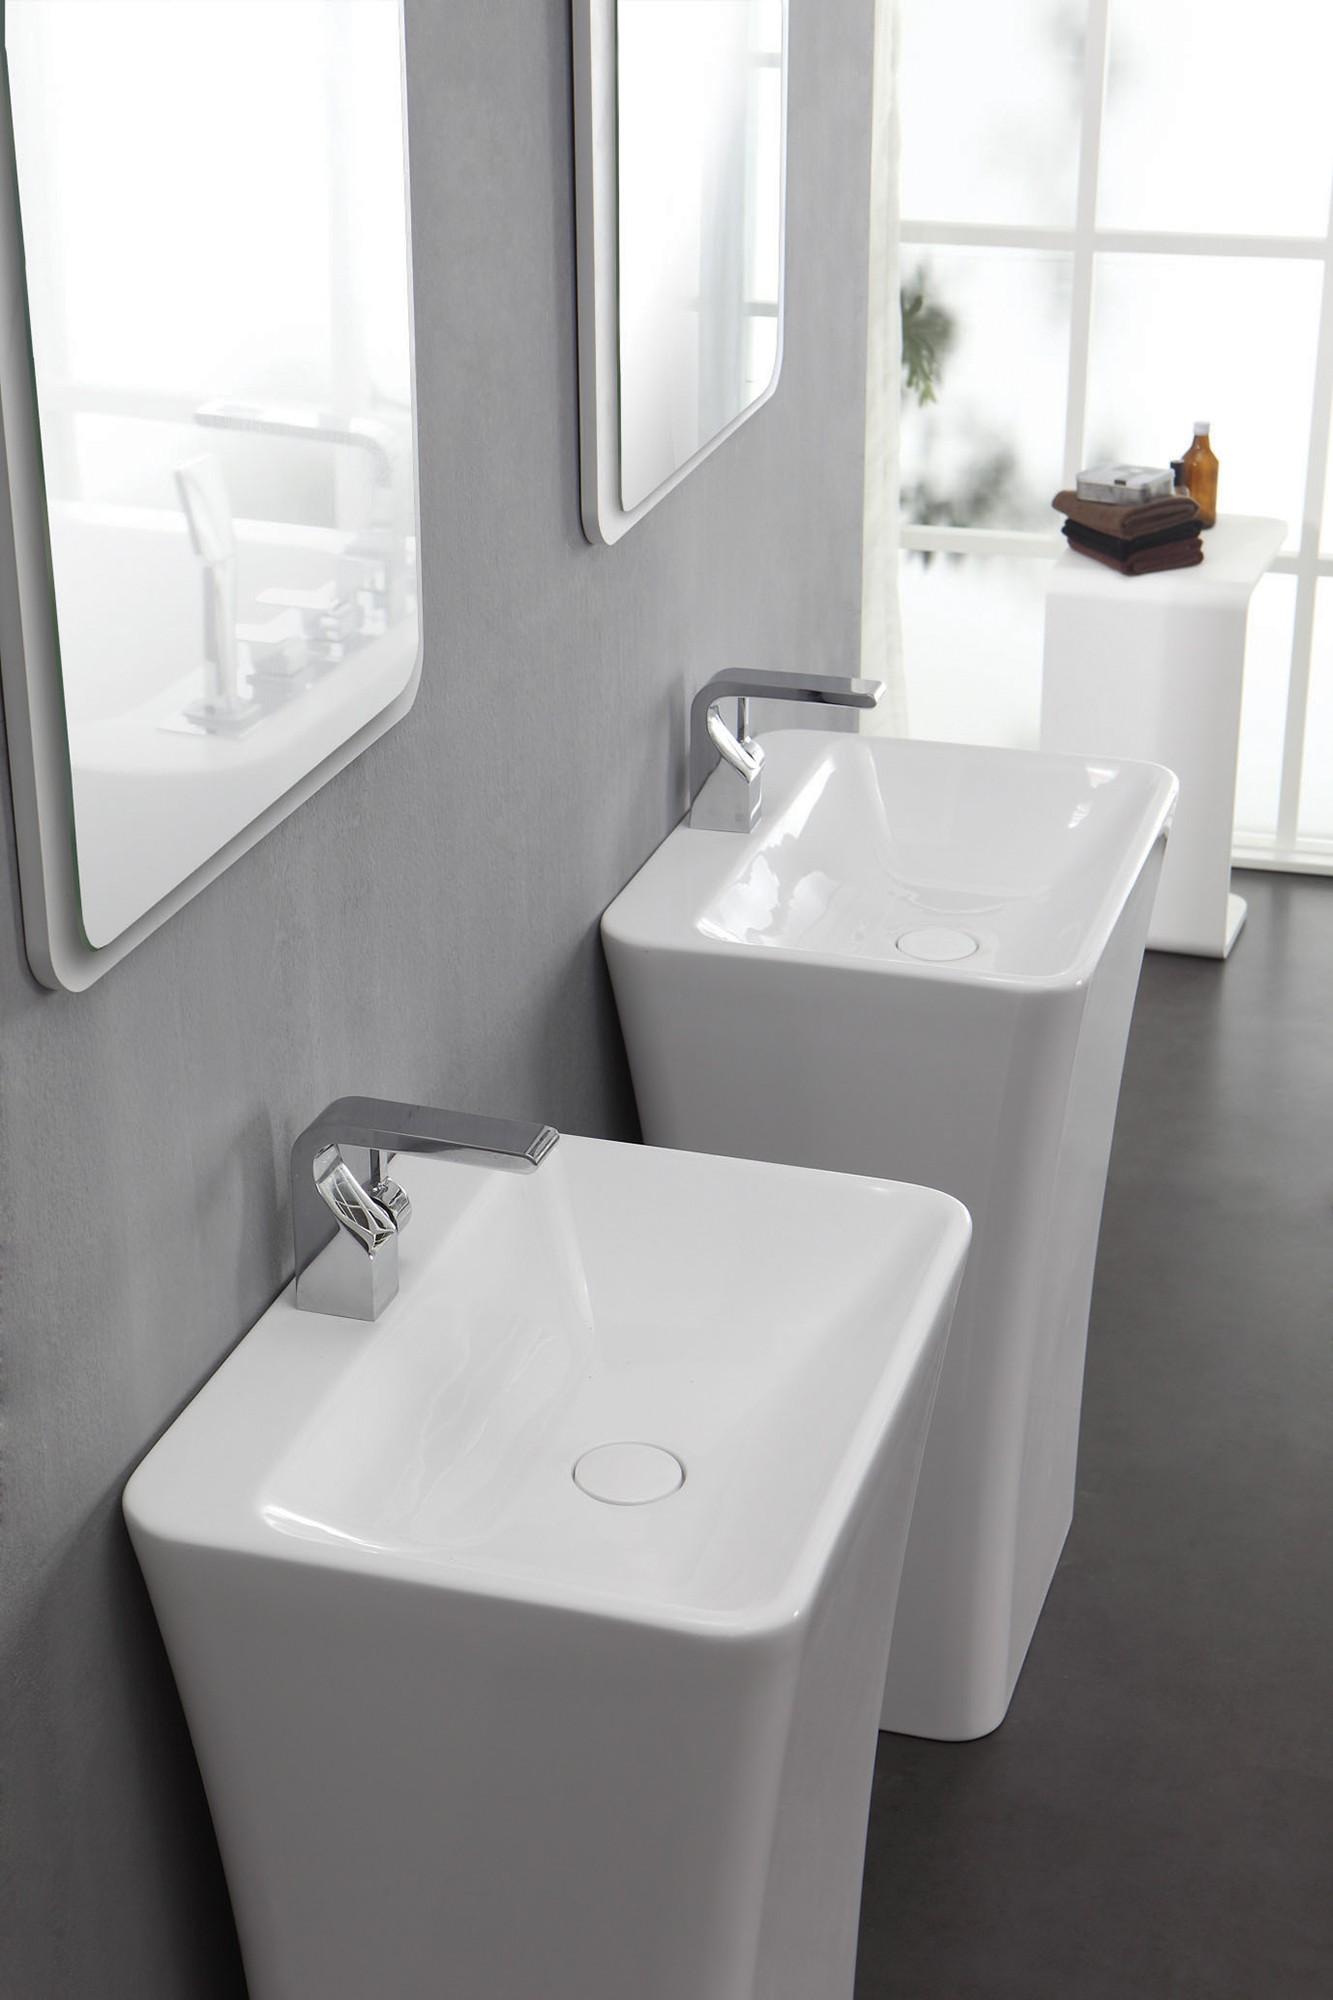 KZOAO-Badeset Waschsäule II + Spiegel